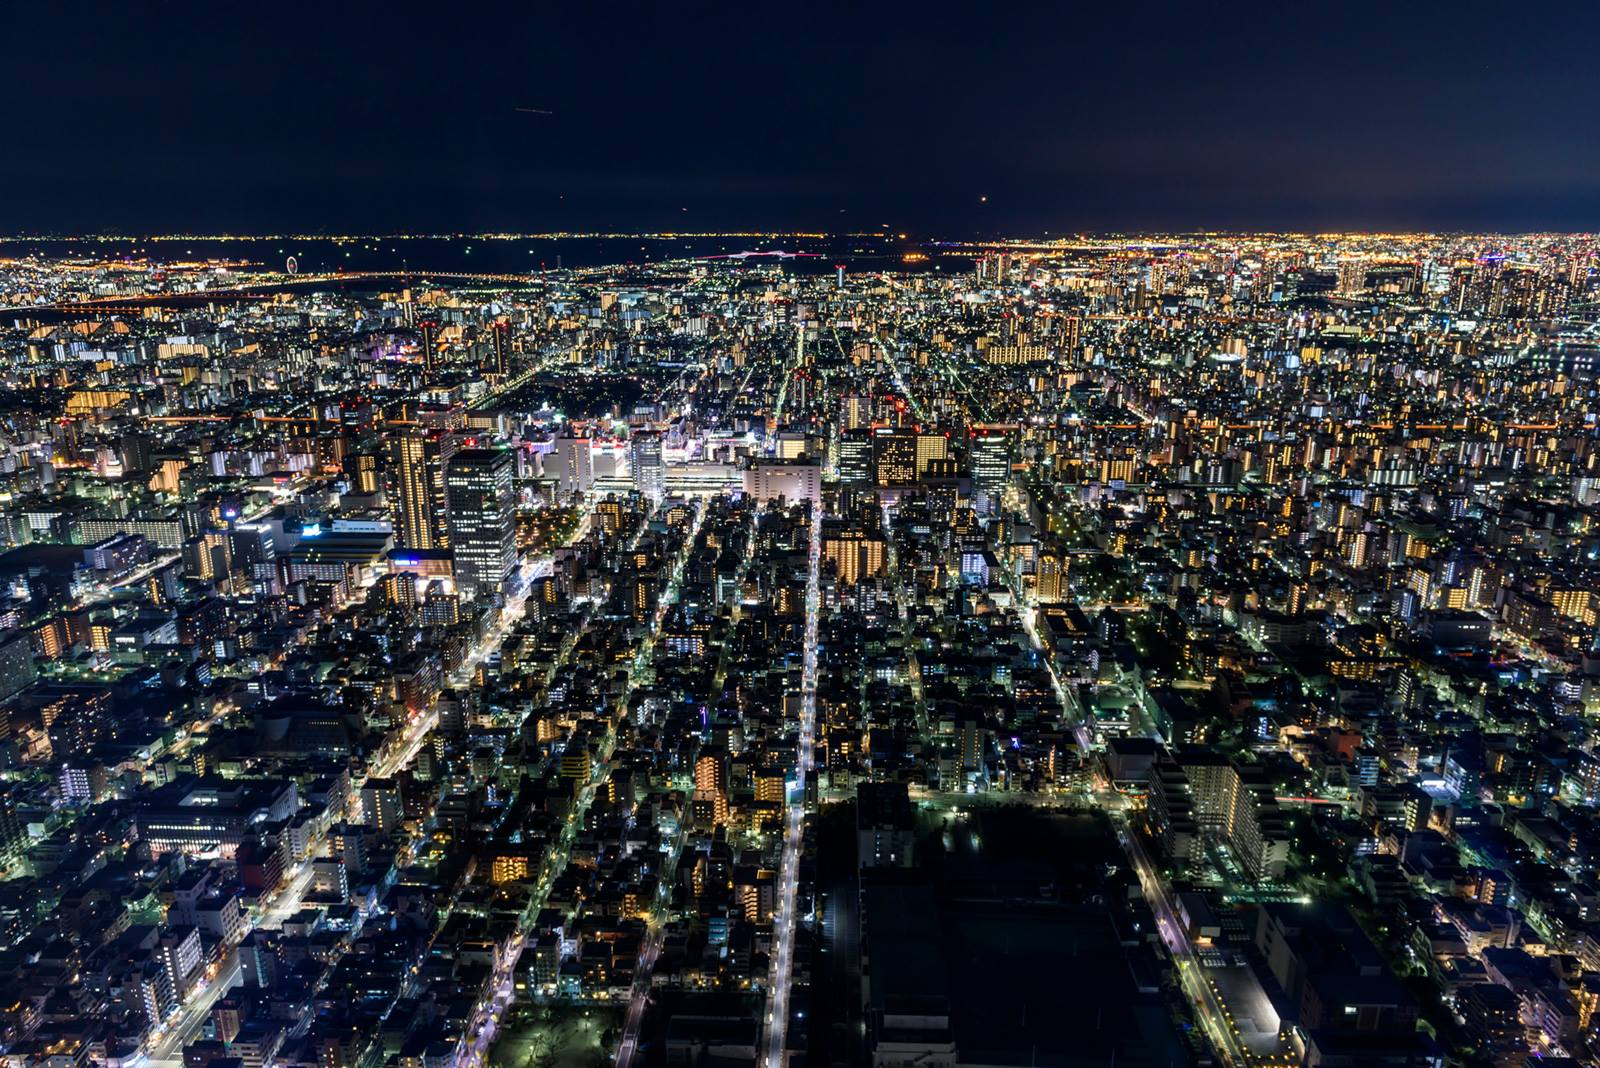 tokyo sky tree la nuit